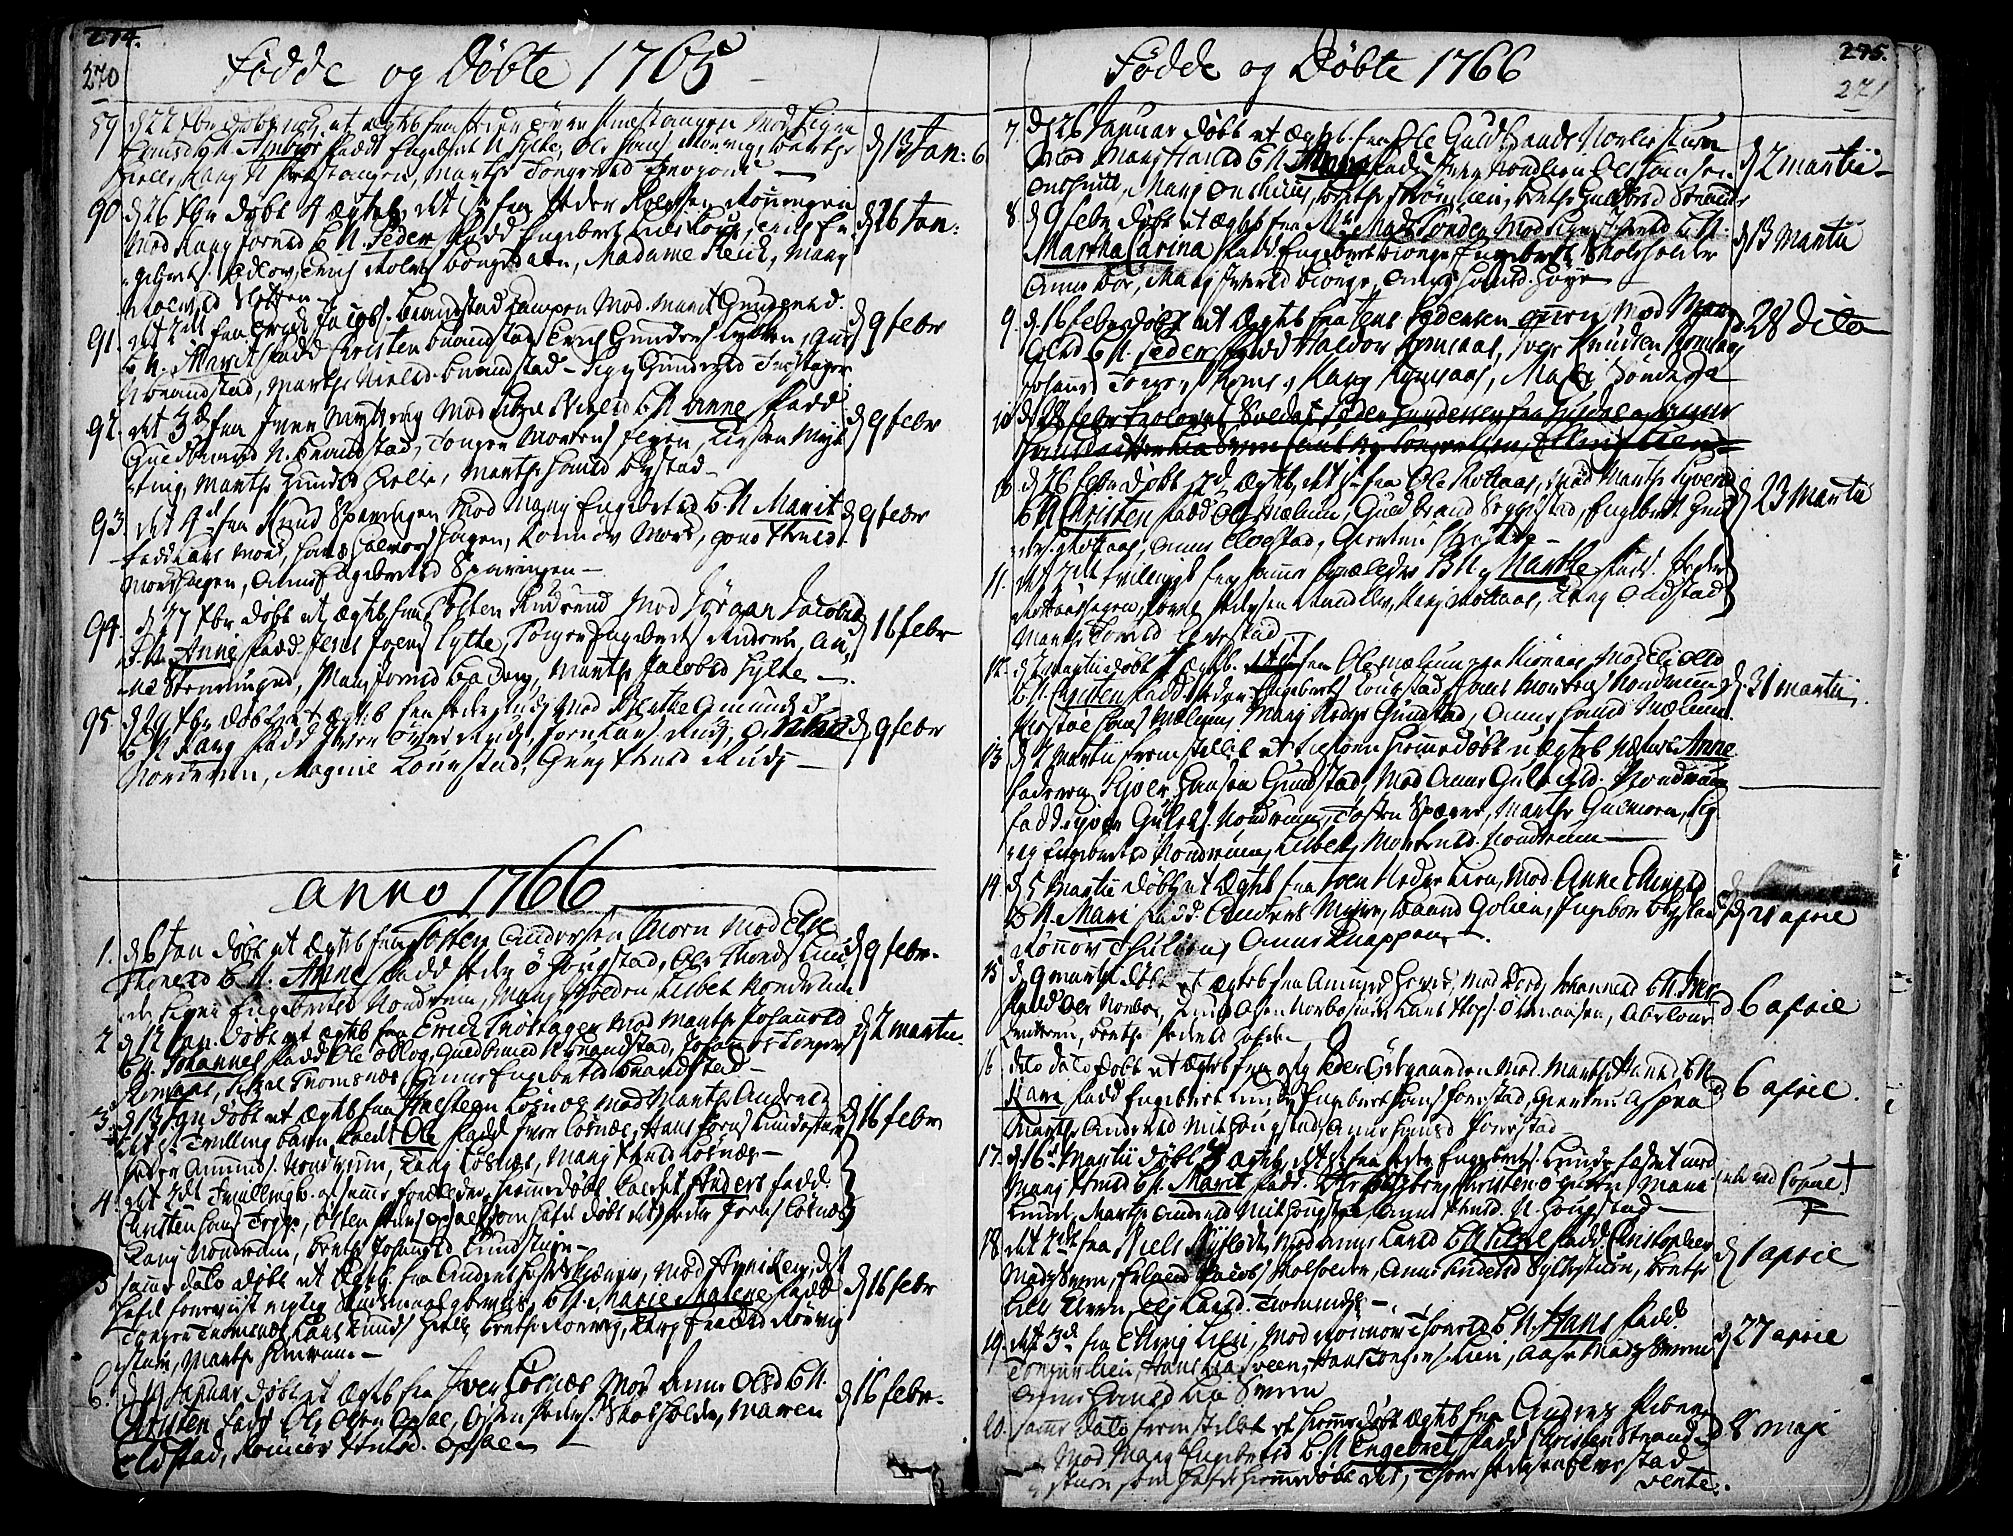 SAH, Ringebu prestekontor, Ministerialbok nr. 2, 1734-1780, s. 270-271